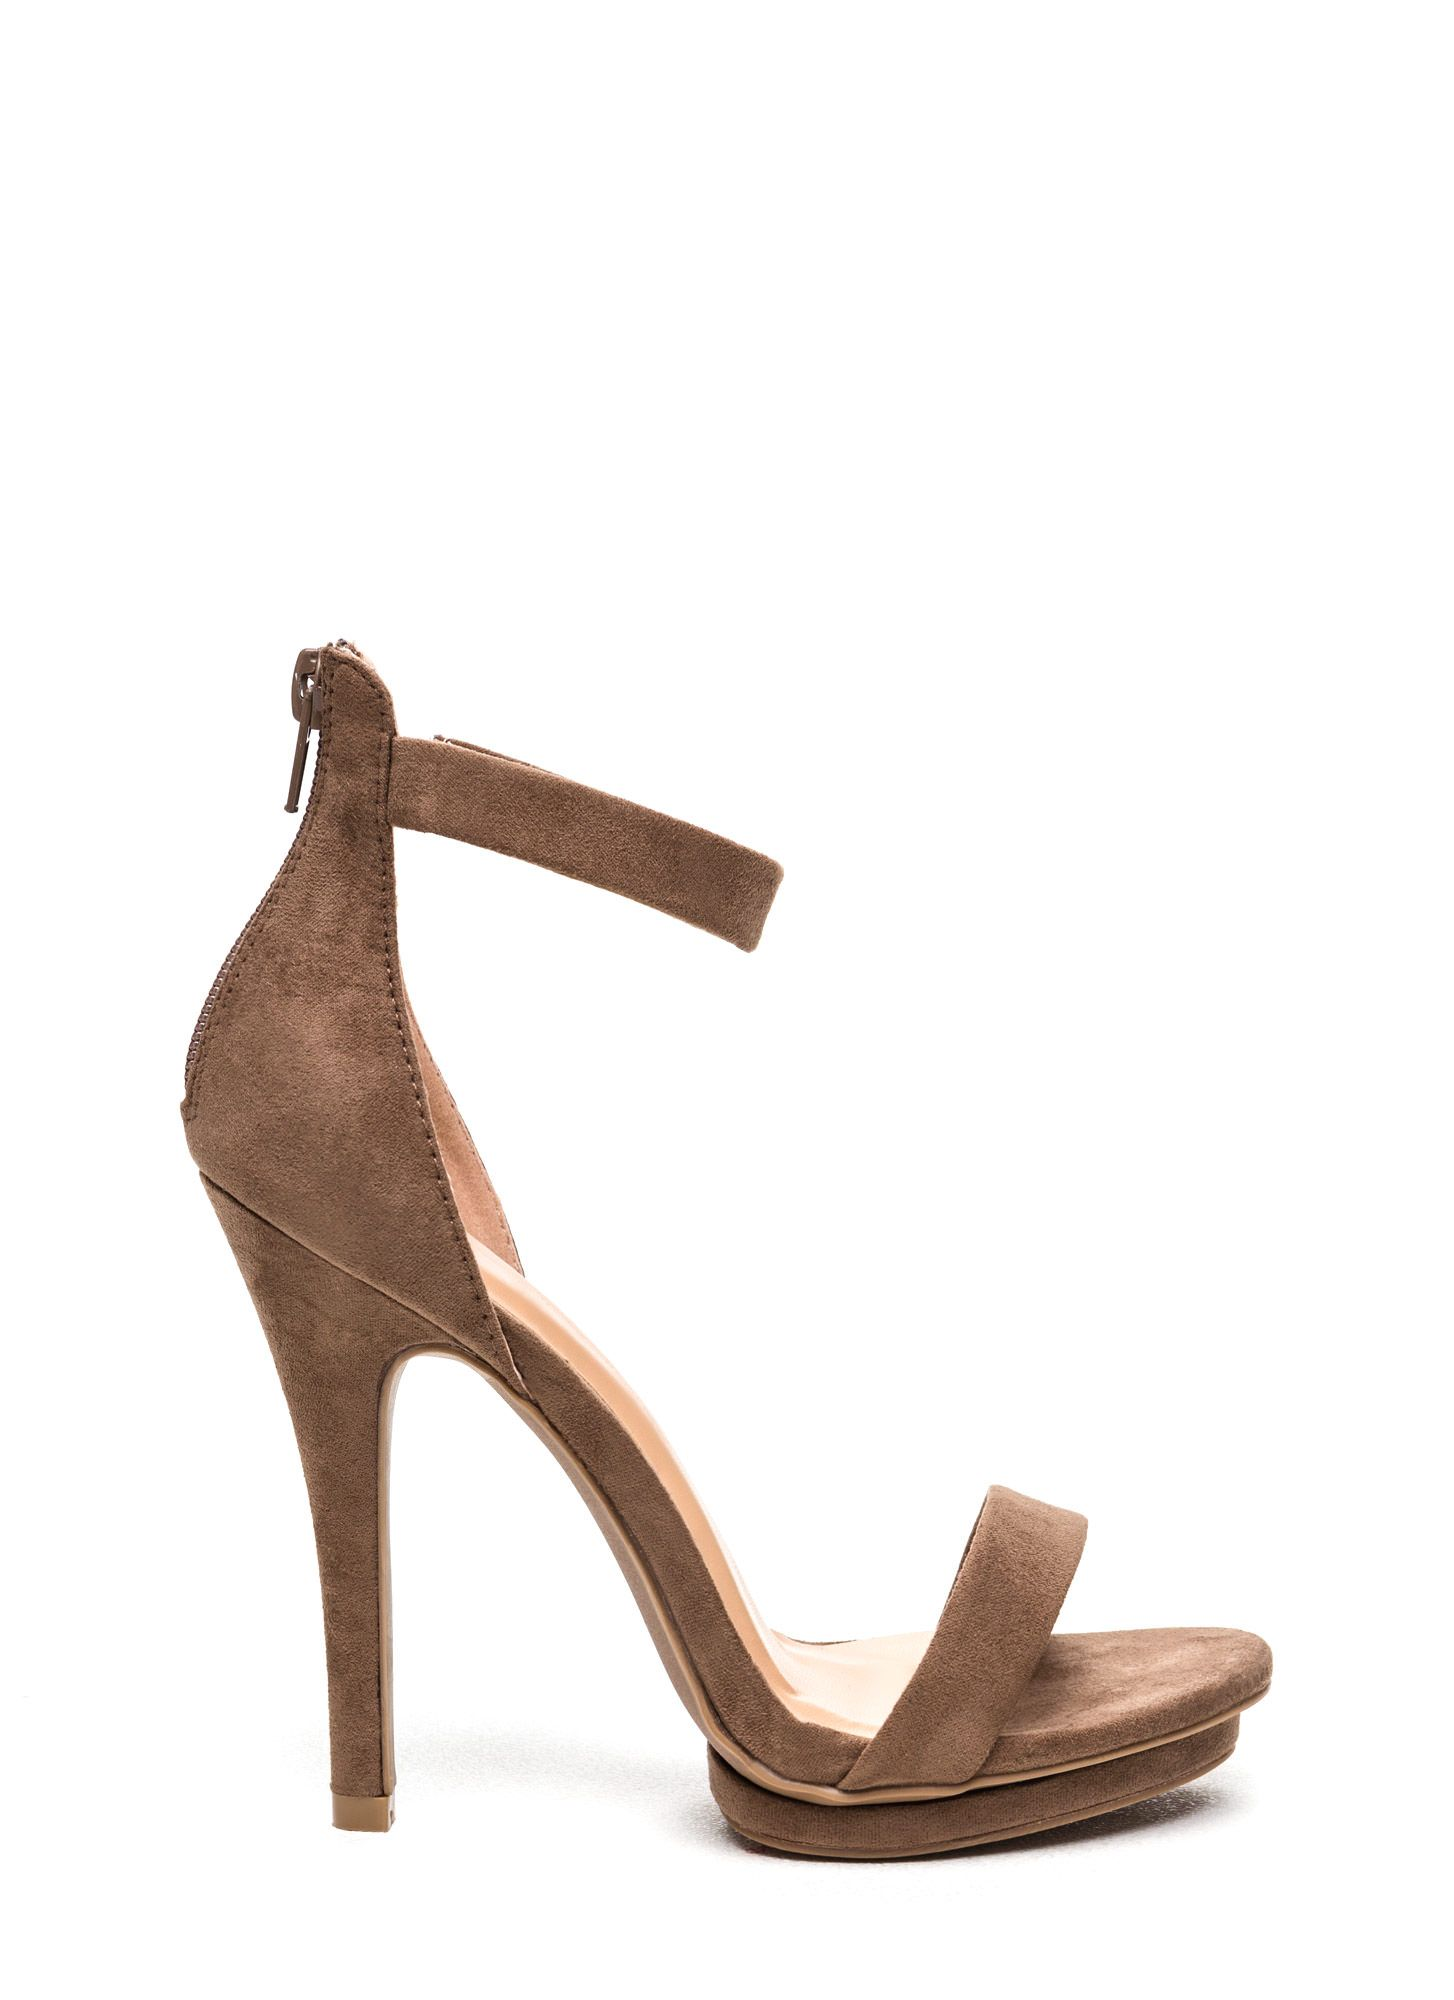 564be5ac52878 Living Single Stacked Platform Heels | HEELS | Heels, Shoes, Shoe Closet